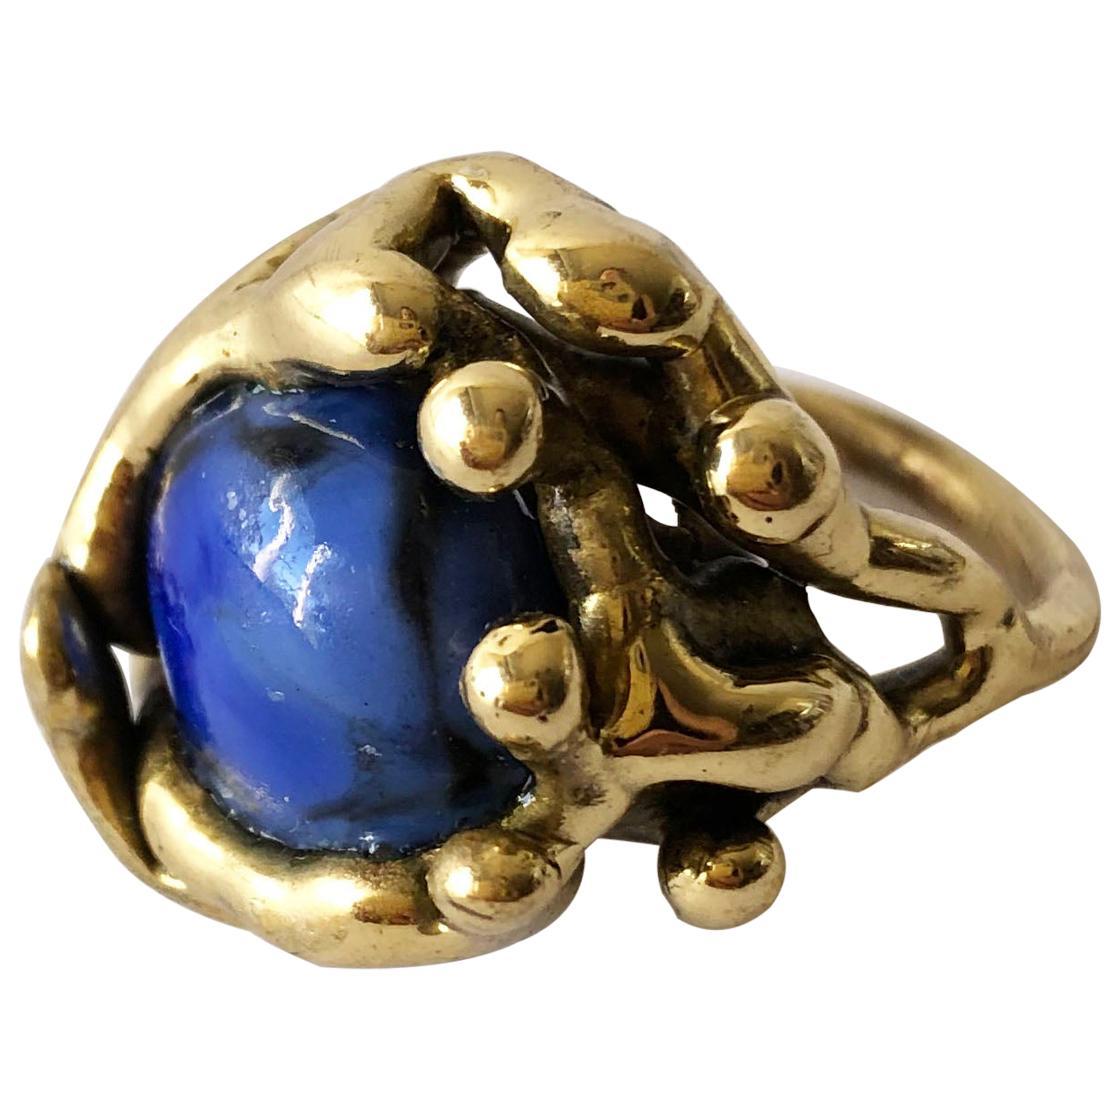 Michael Schwade Handmade Bronze with Blue Glass Organic Modernist Ring